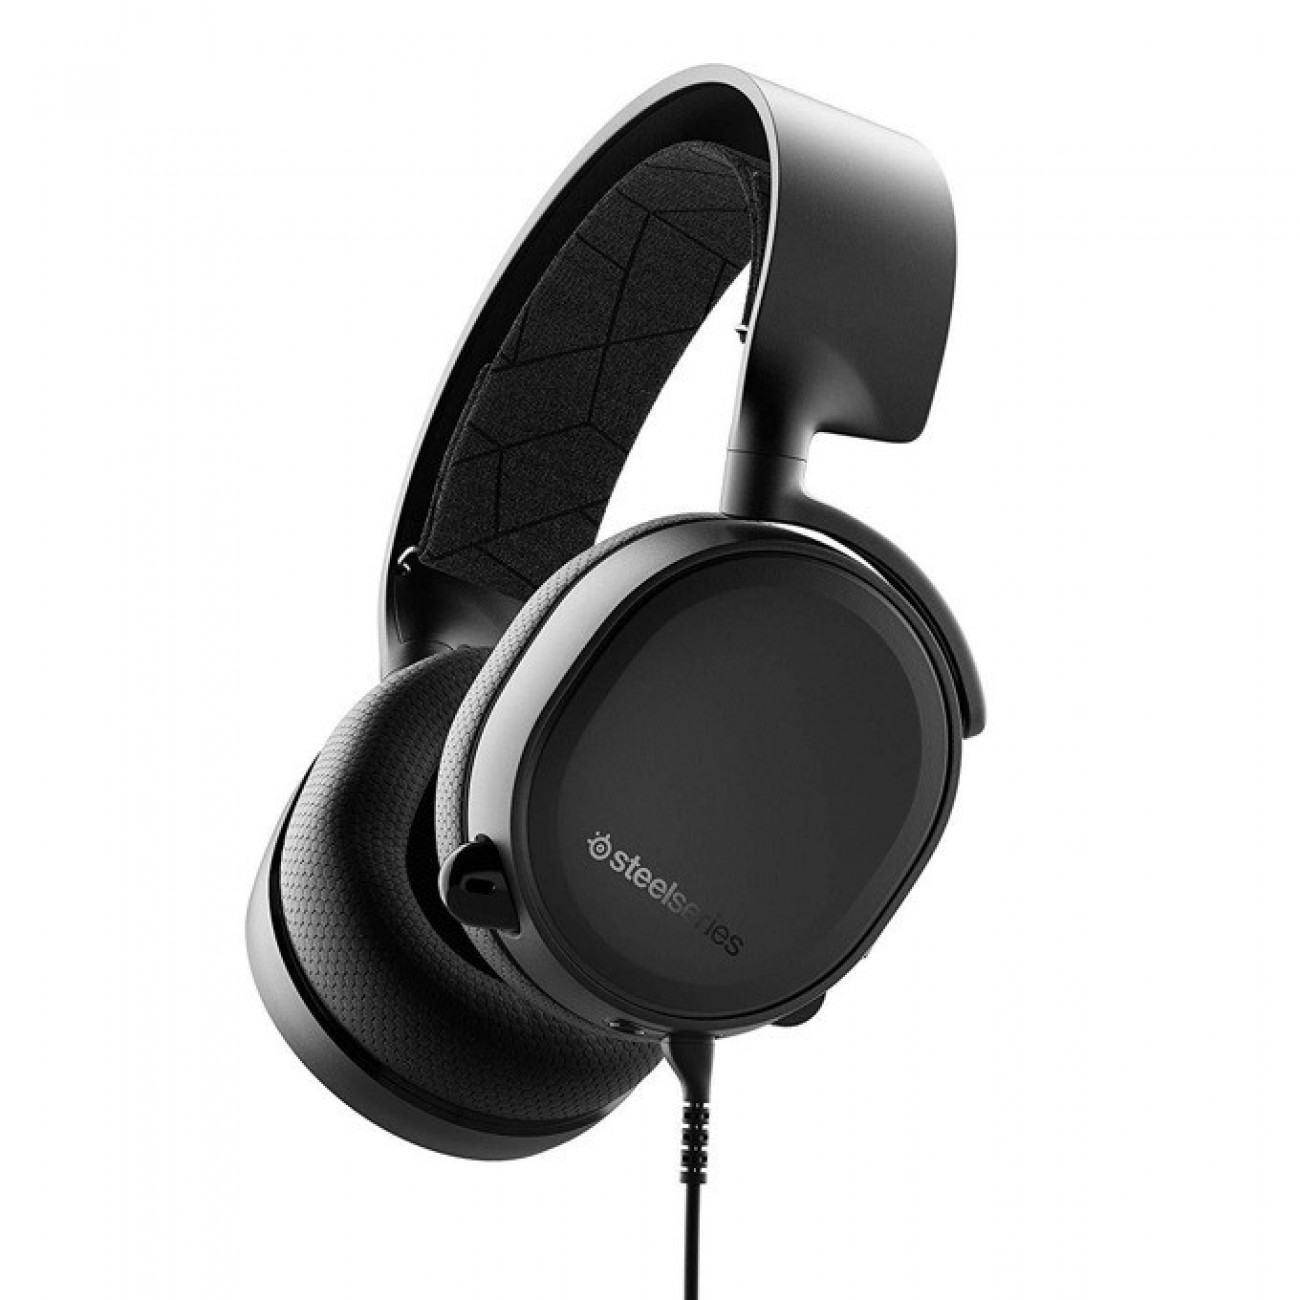 Слушалки Steel Series ARCTIS 3 2019 Edition, гейминг, микрофон, контрол на звука, черни в Слушалки - SteelSeries | Alleop